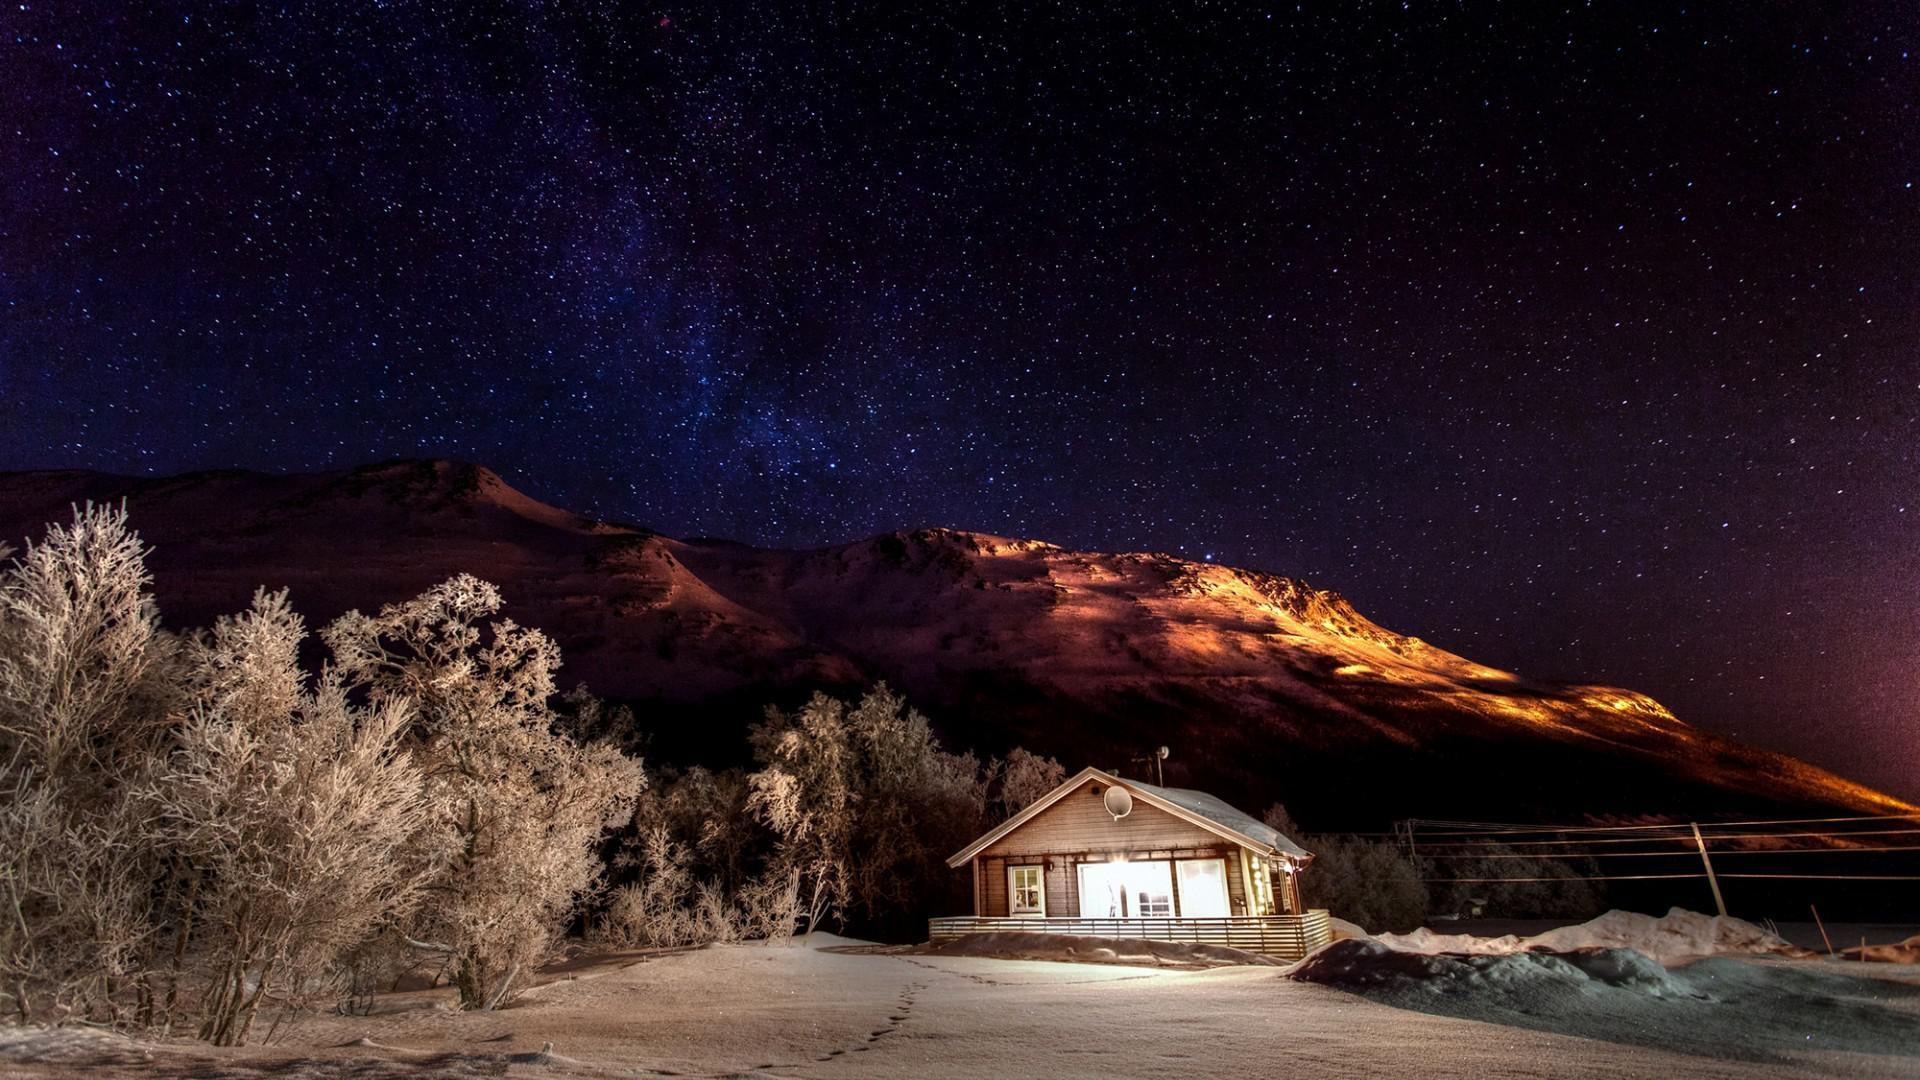 Mountains, winter, nature, snow, night, sky, desktop